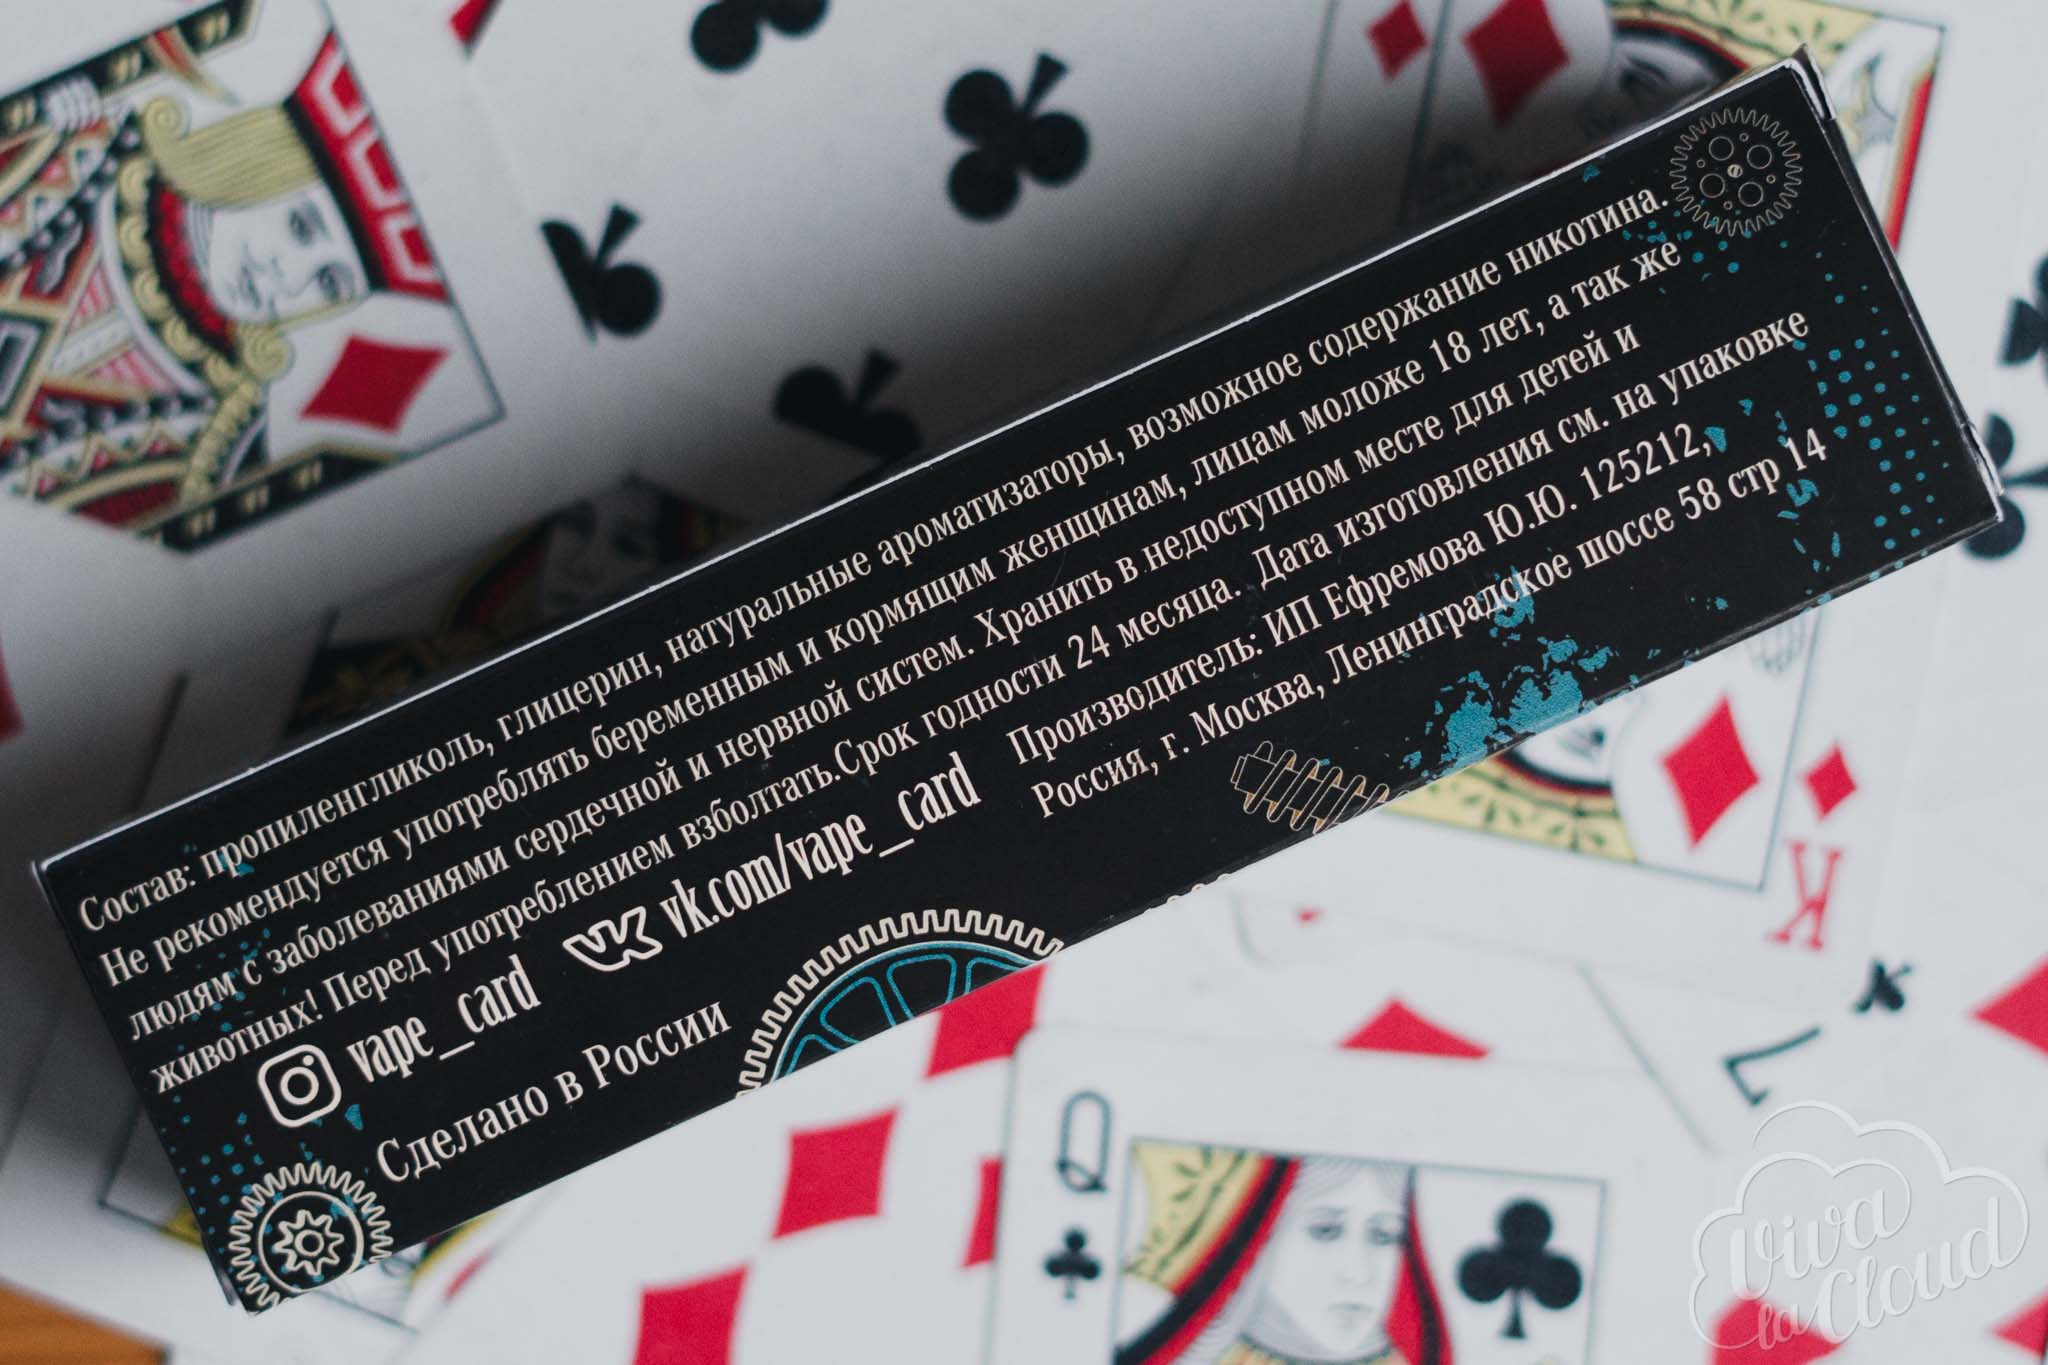 VAPE CARD